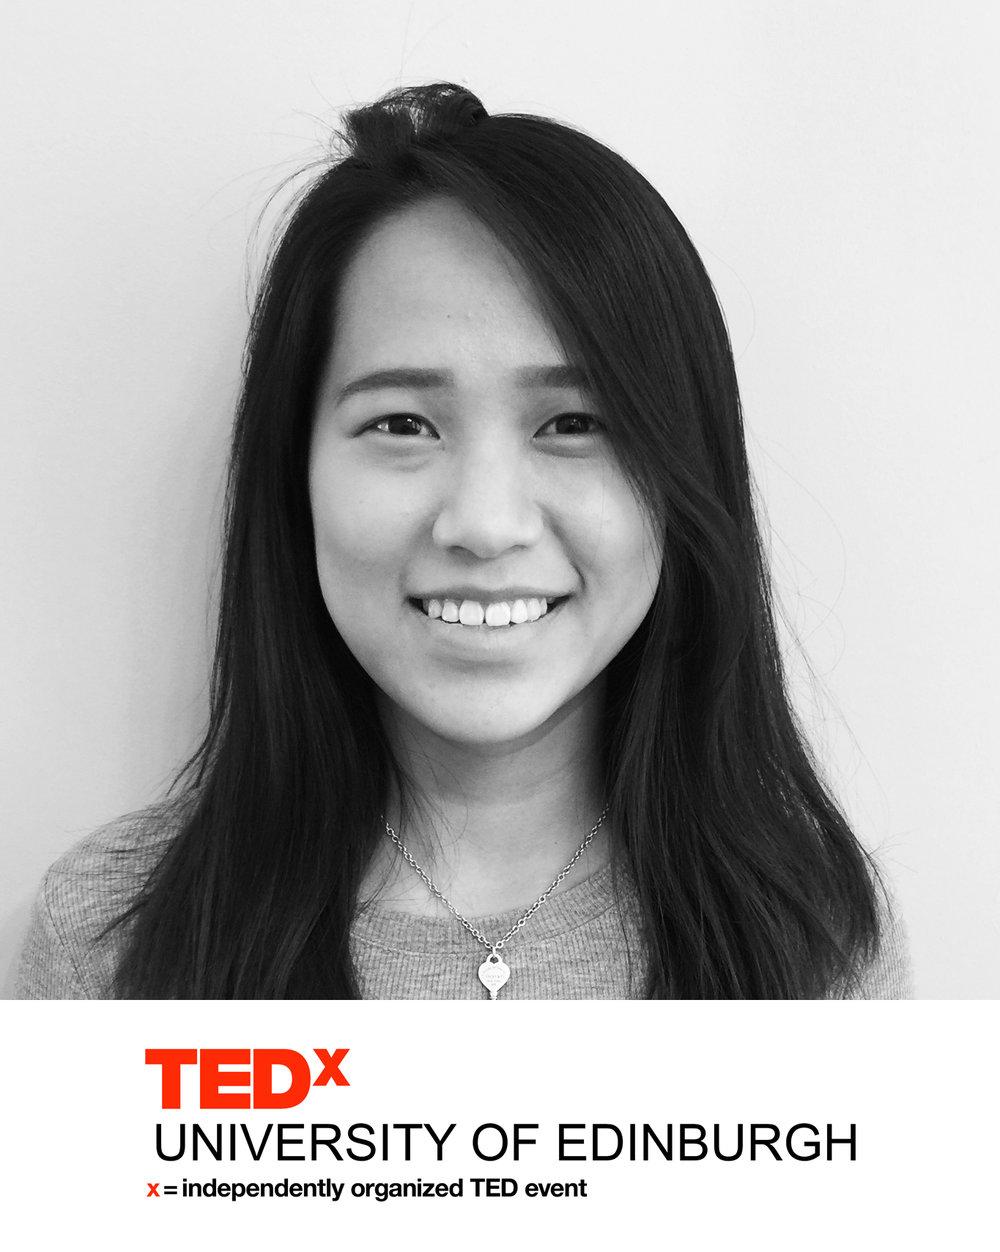 Marianne Lim Event Co-ordinator